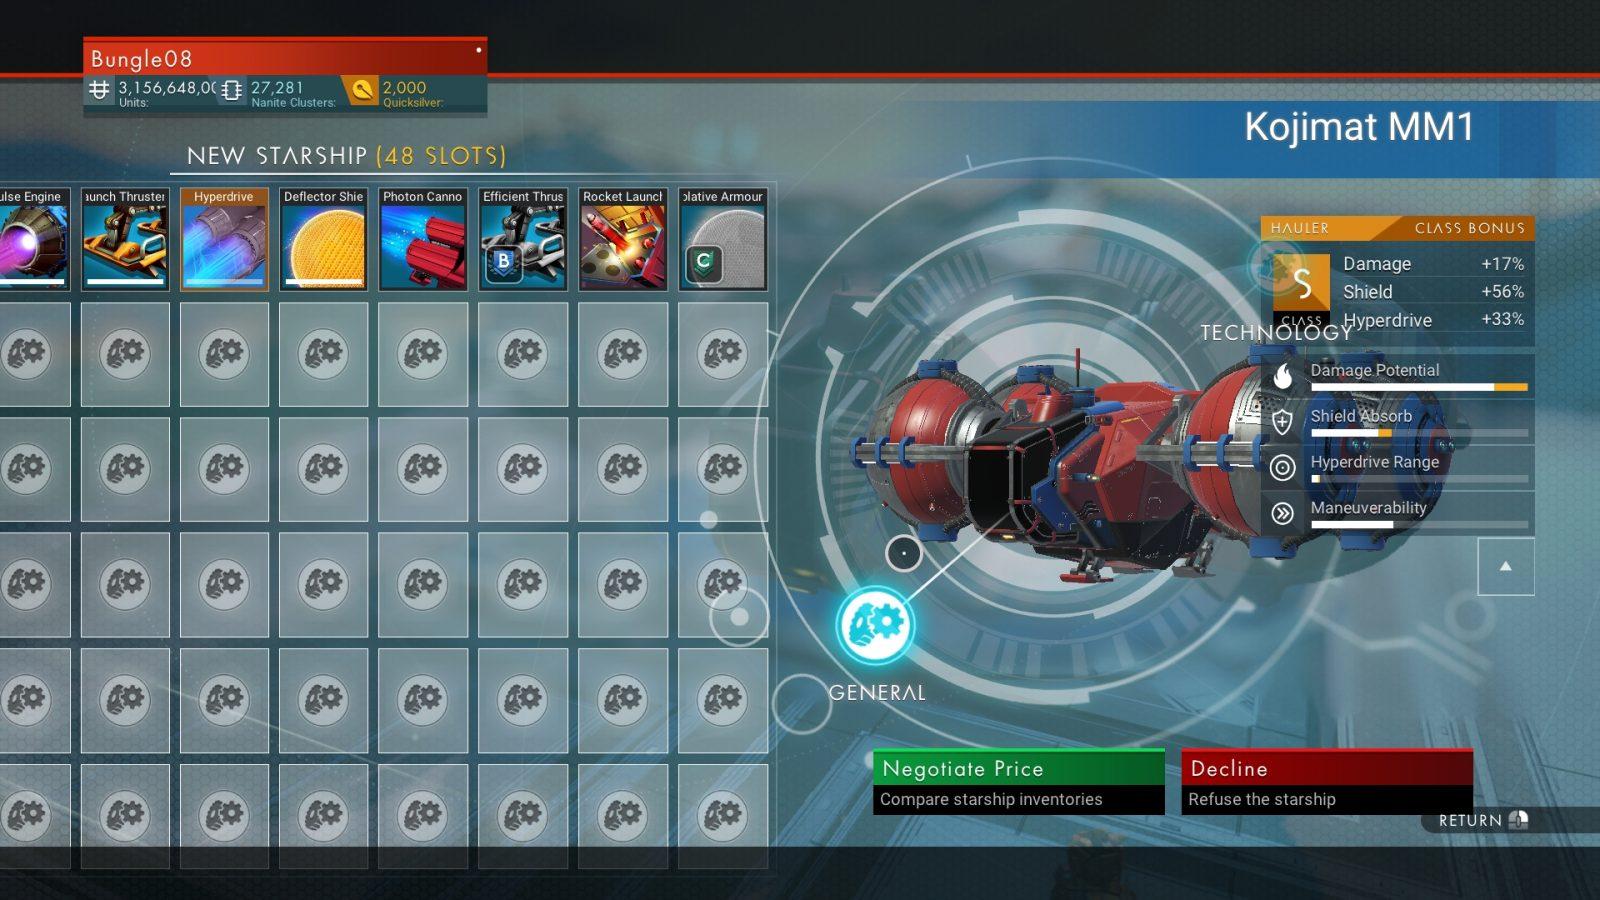 Max Inventory Max Stats Max Class